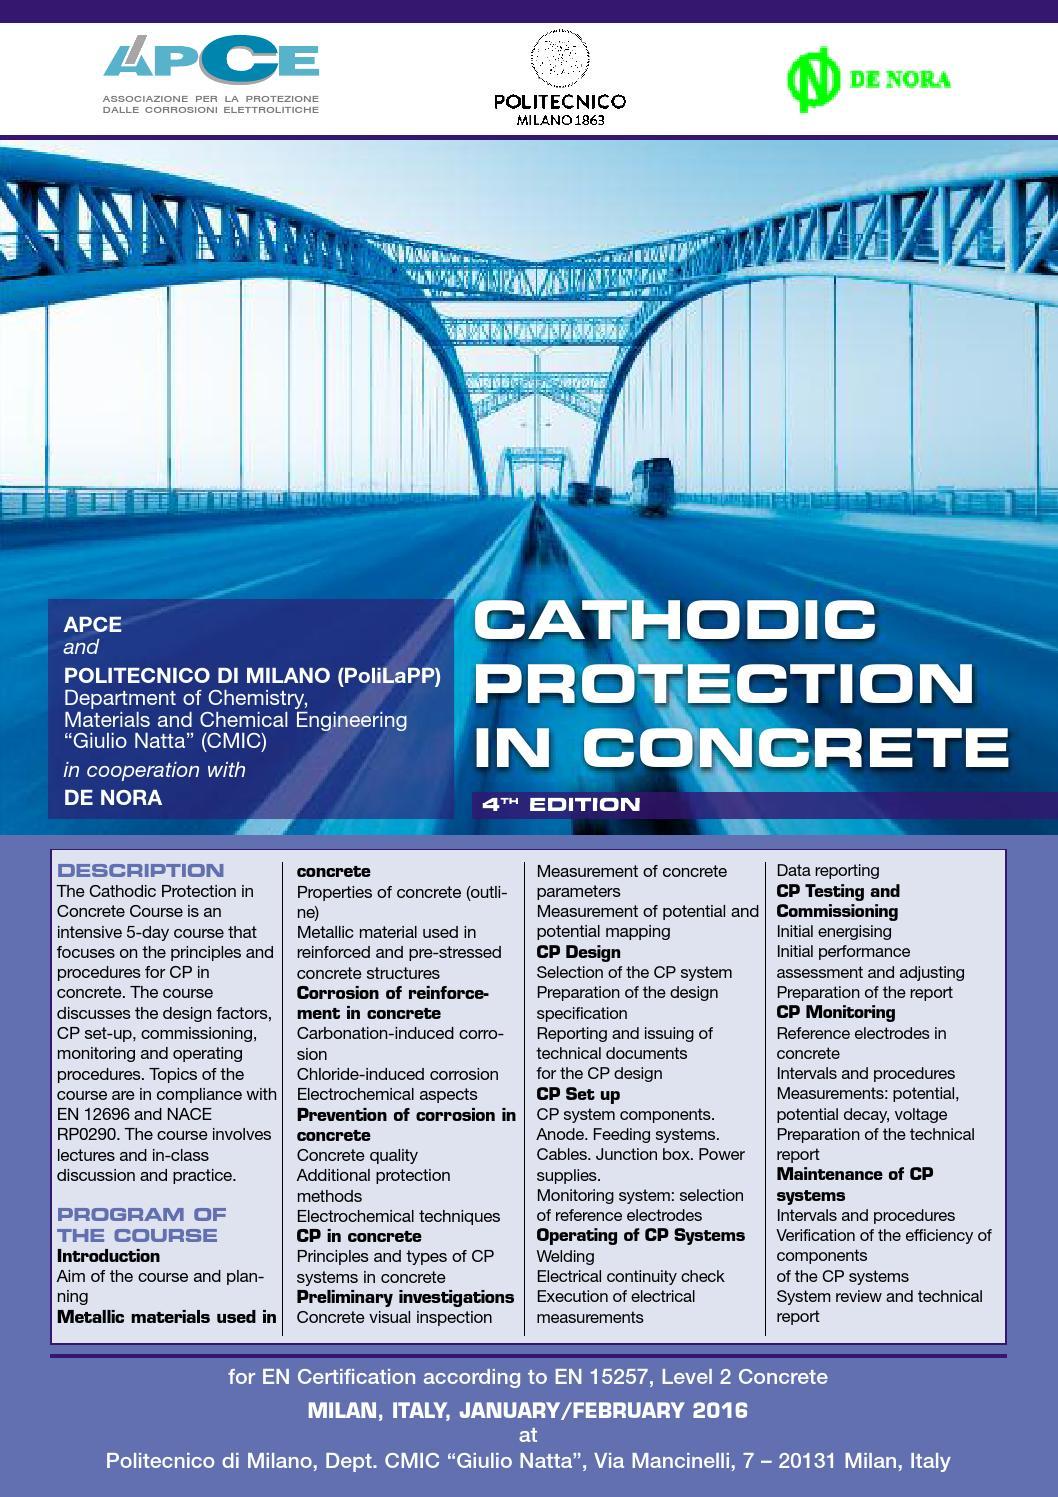 Apce notizie n 60 - giugno 2015 by Fabio Brugnetti - issuu